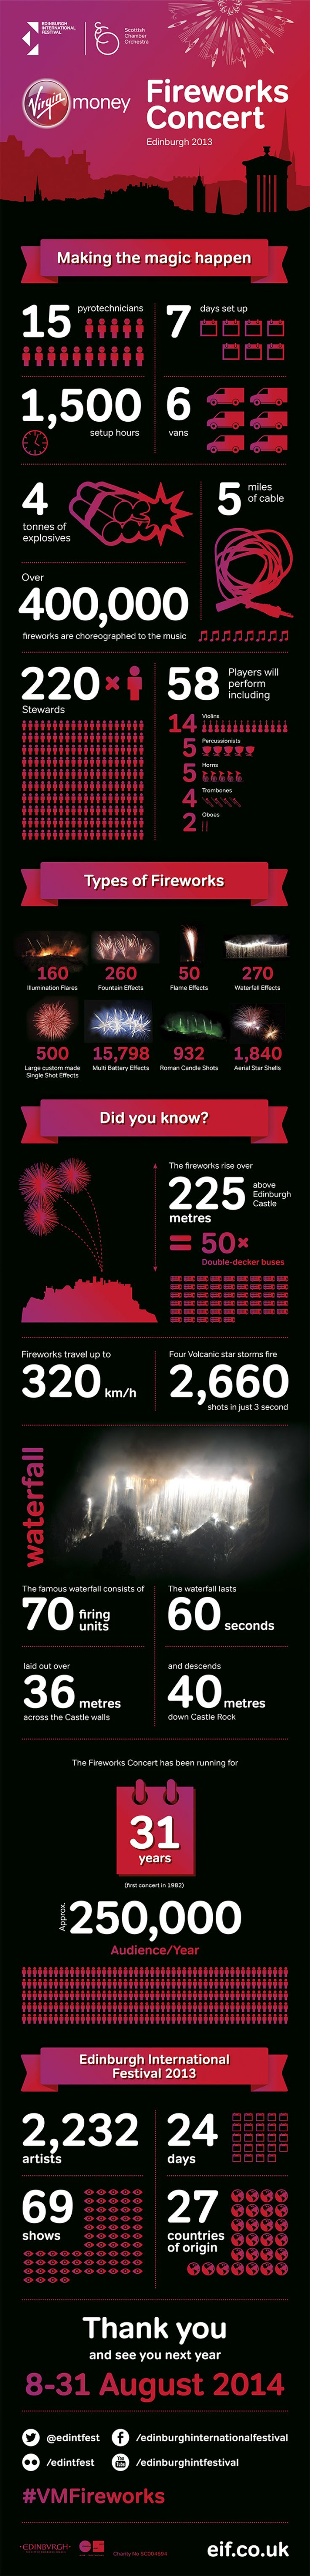 Edinburgh International Festival 2013 Fireworks Concert |Infographic